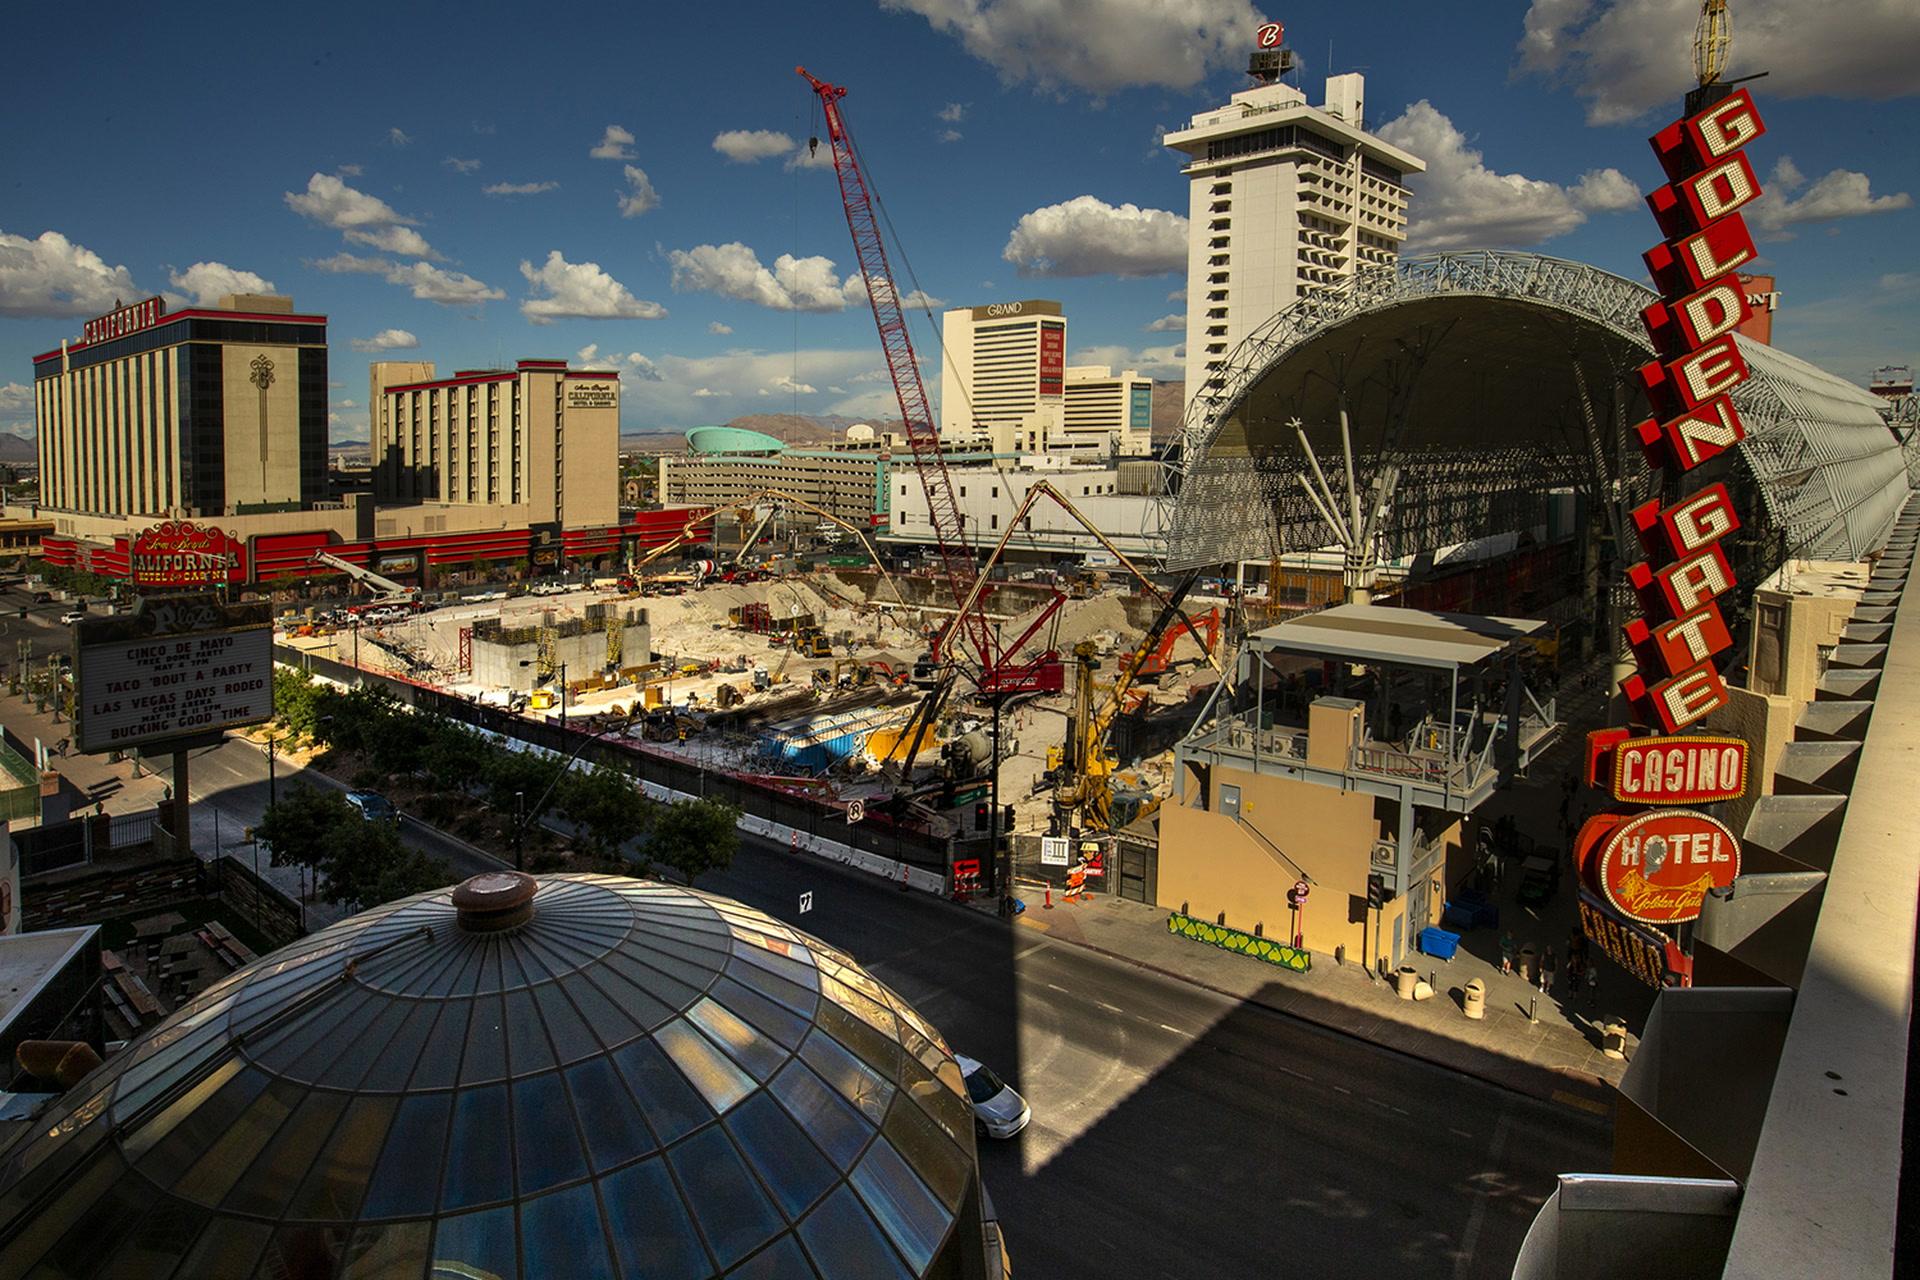 Las Vegas Show Calendar December 2020 Circa in downtown Las Vegas on pace for 2020 opening — VIDEO | Las